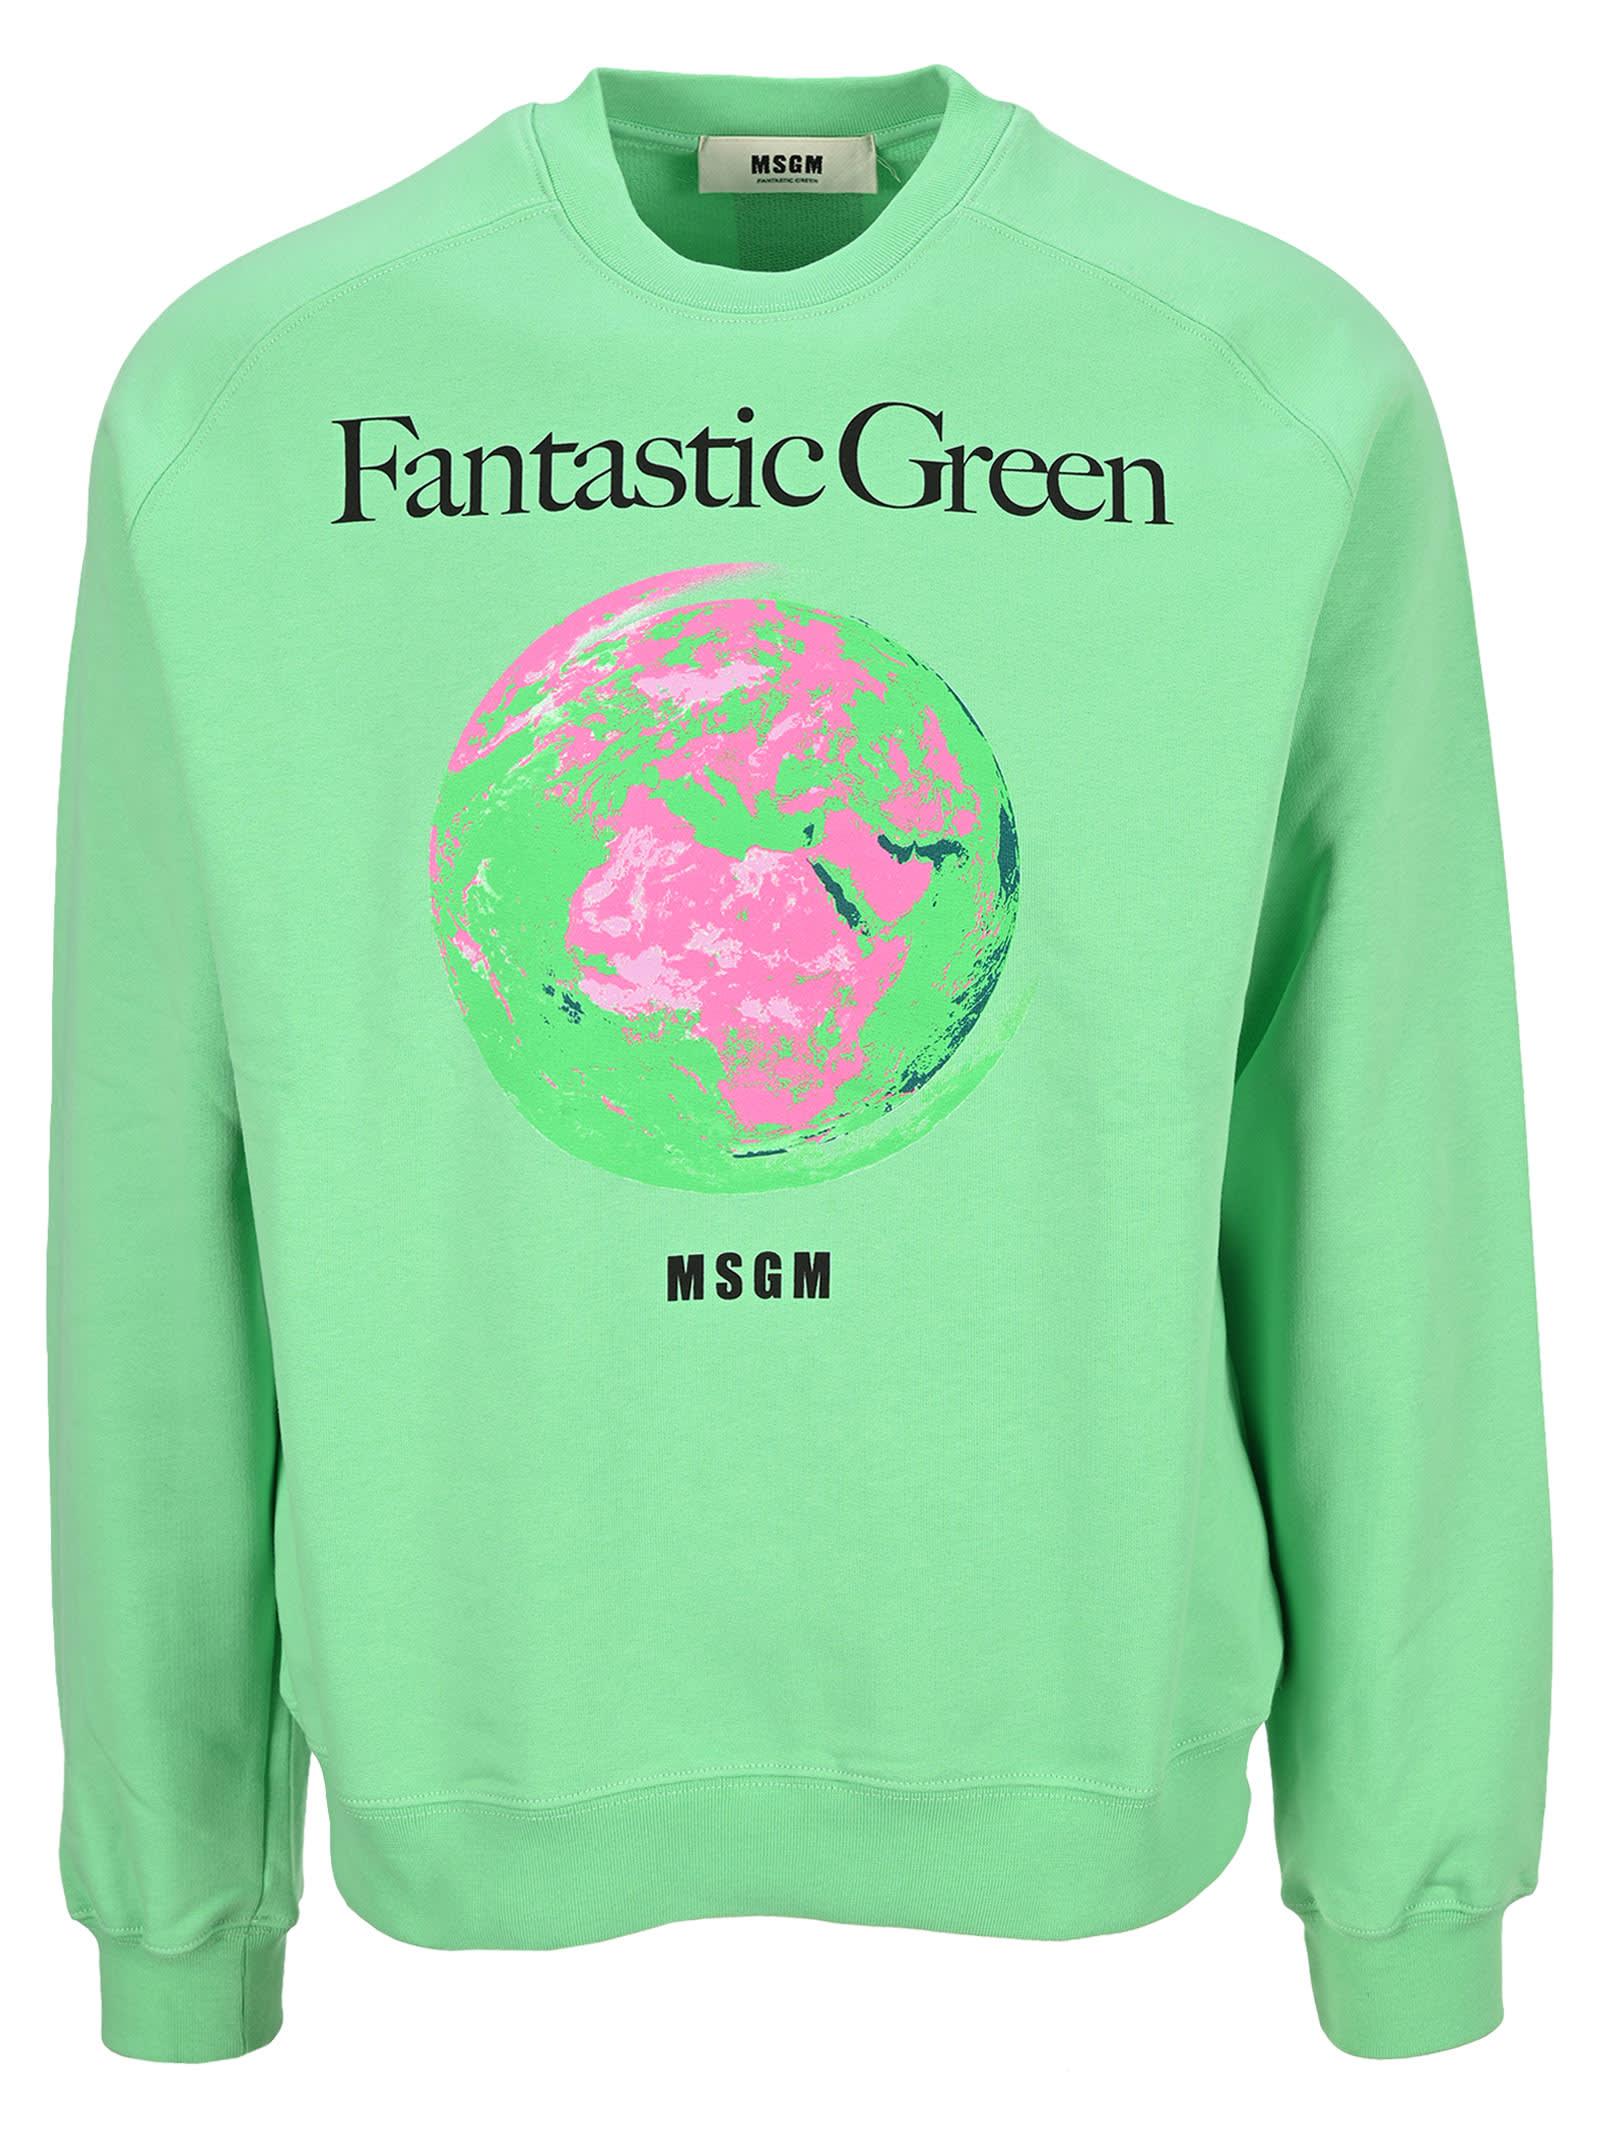 Msgm Fantastic Green Sweatshirt